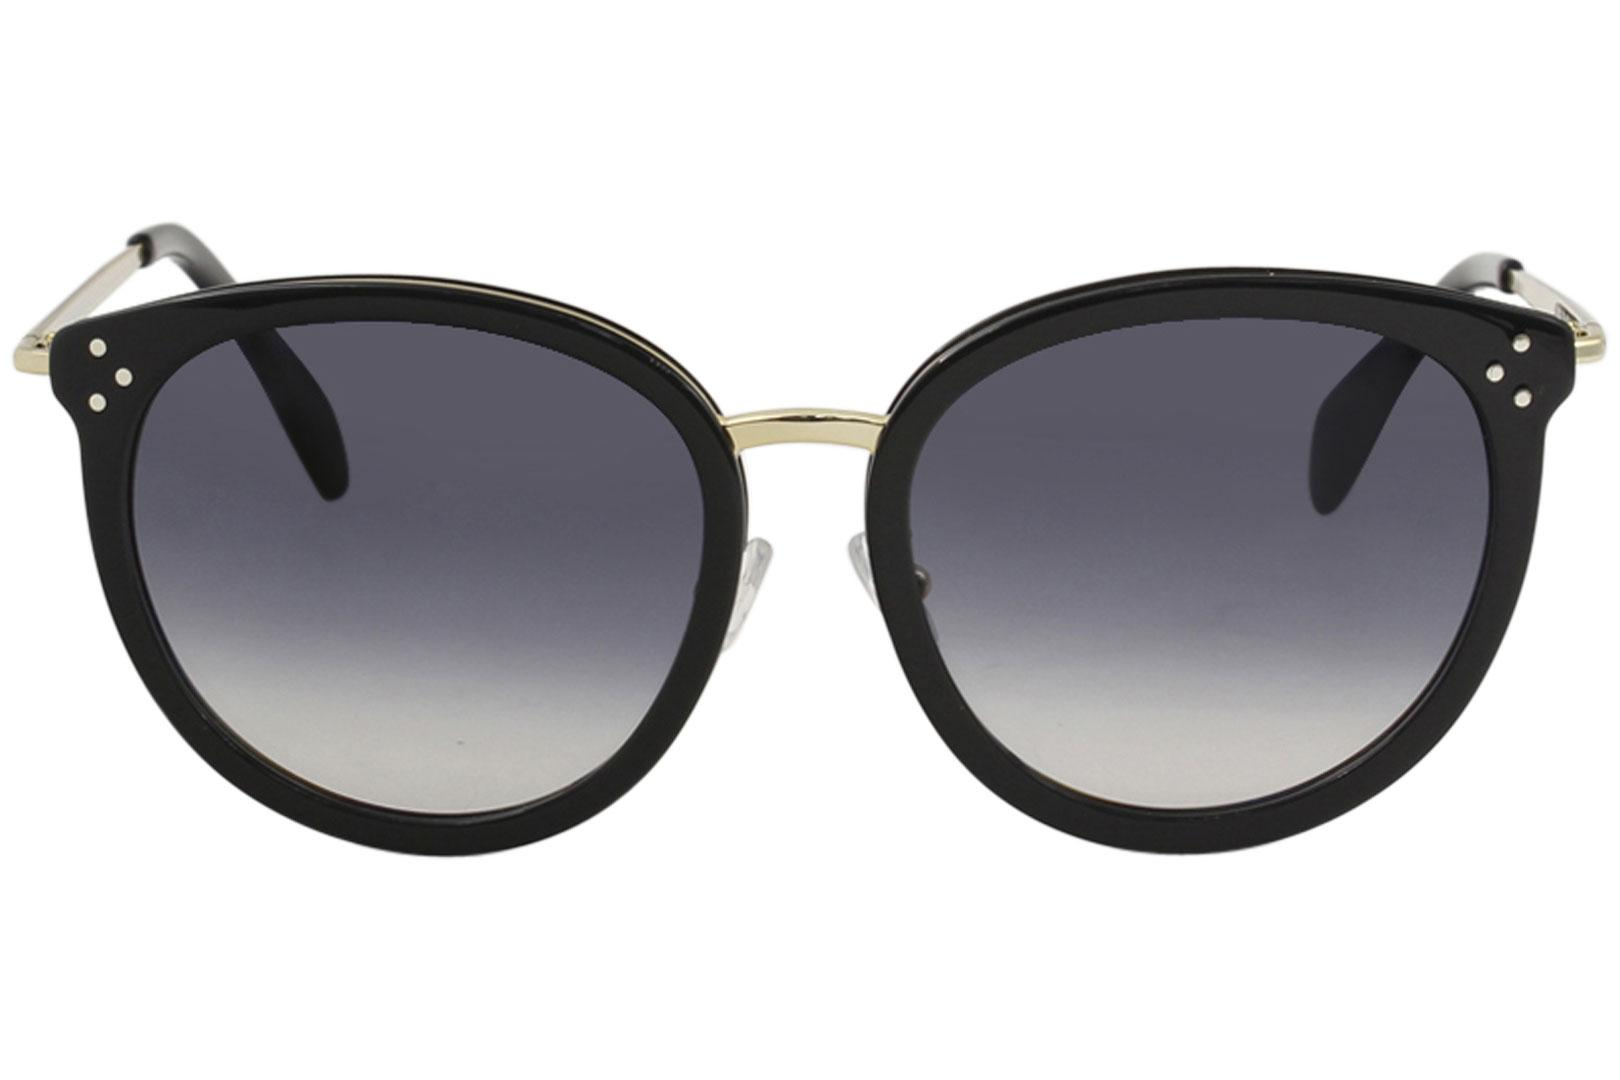 4db6fef00d8 Celine Women s CL40033F CL 40033 F Fashion Round Sunglasses by Celine